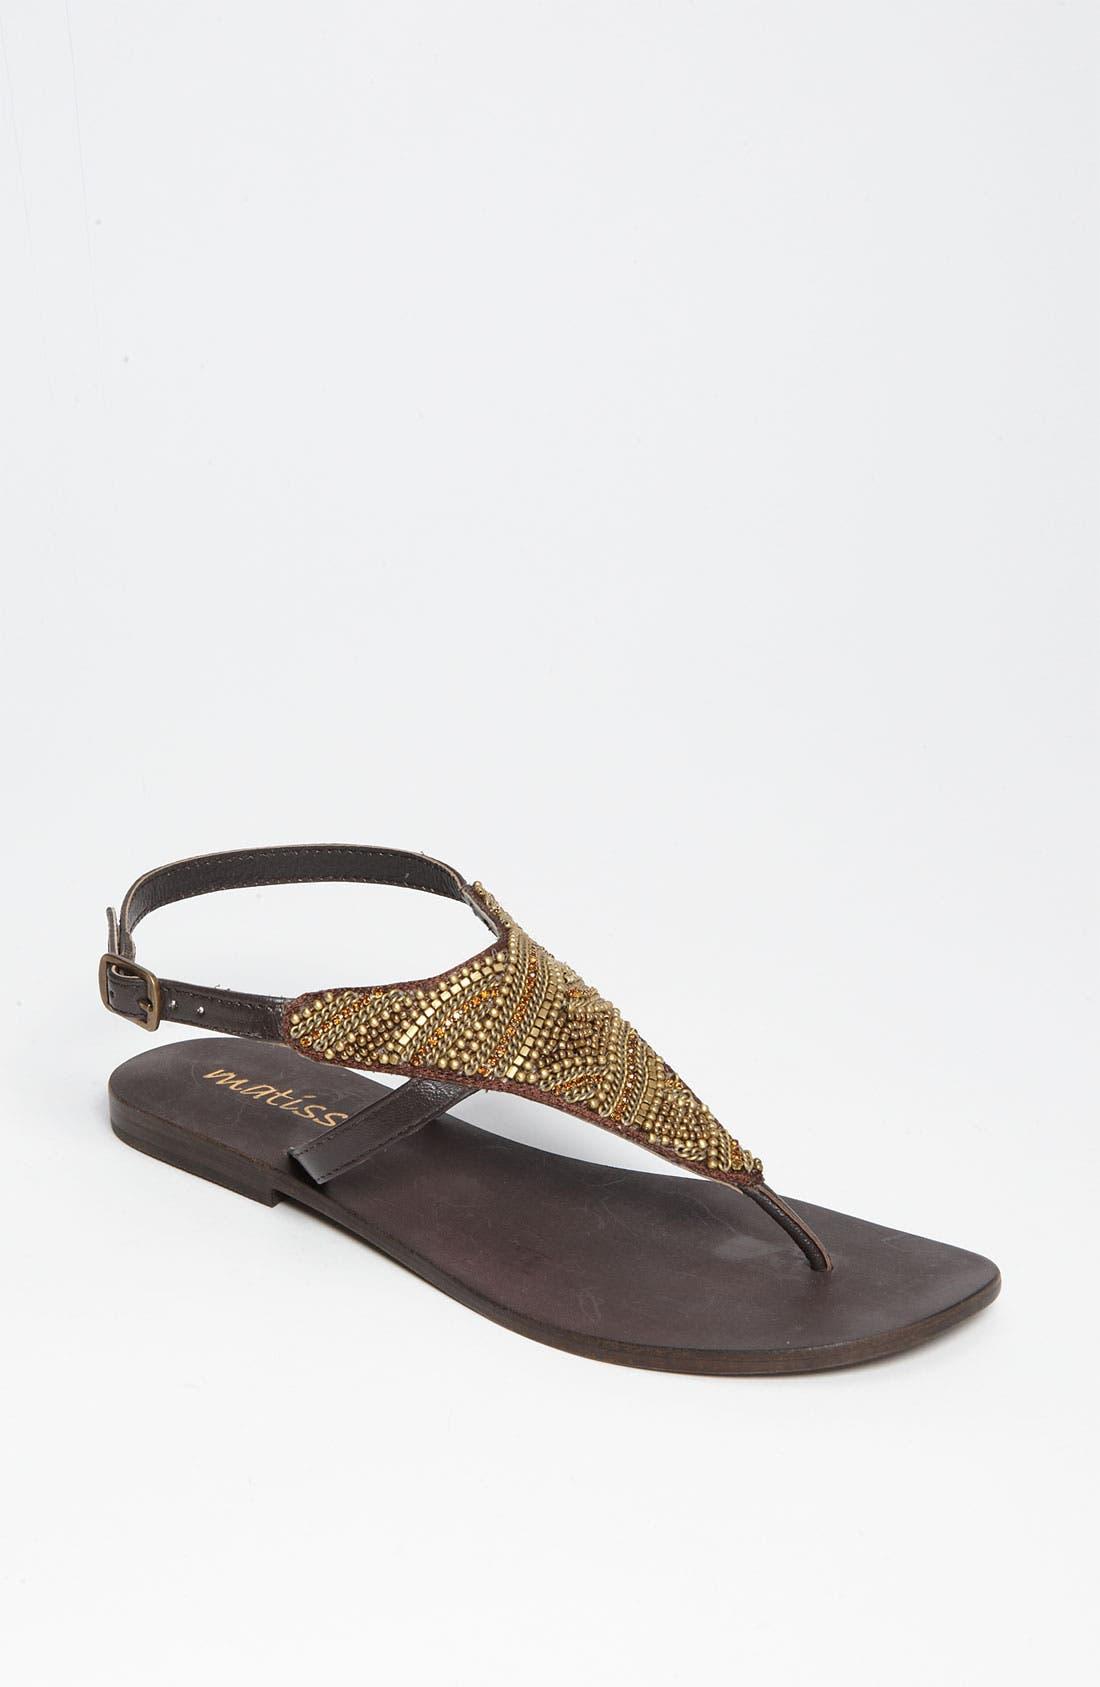 Alternate Image 1 Selected - Matisse 'Dina' Sandal